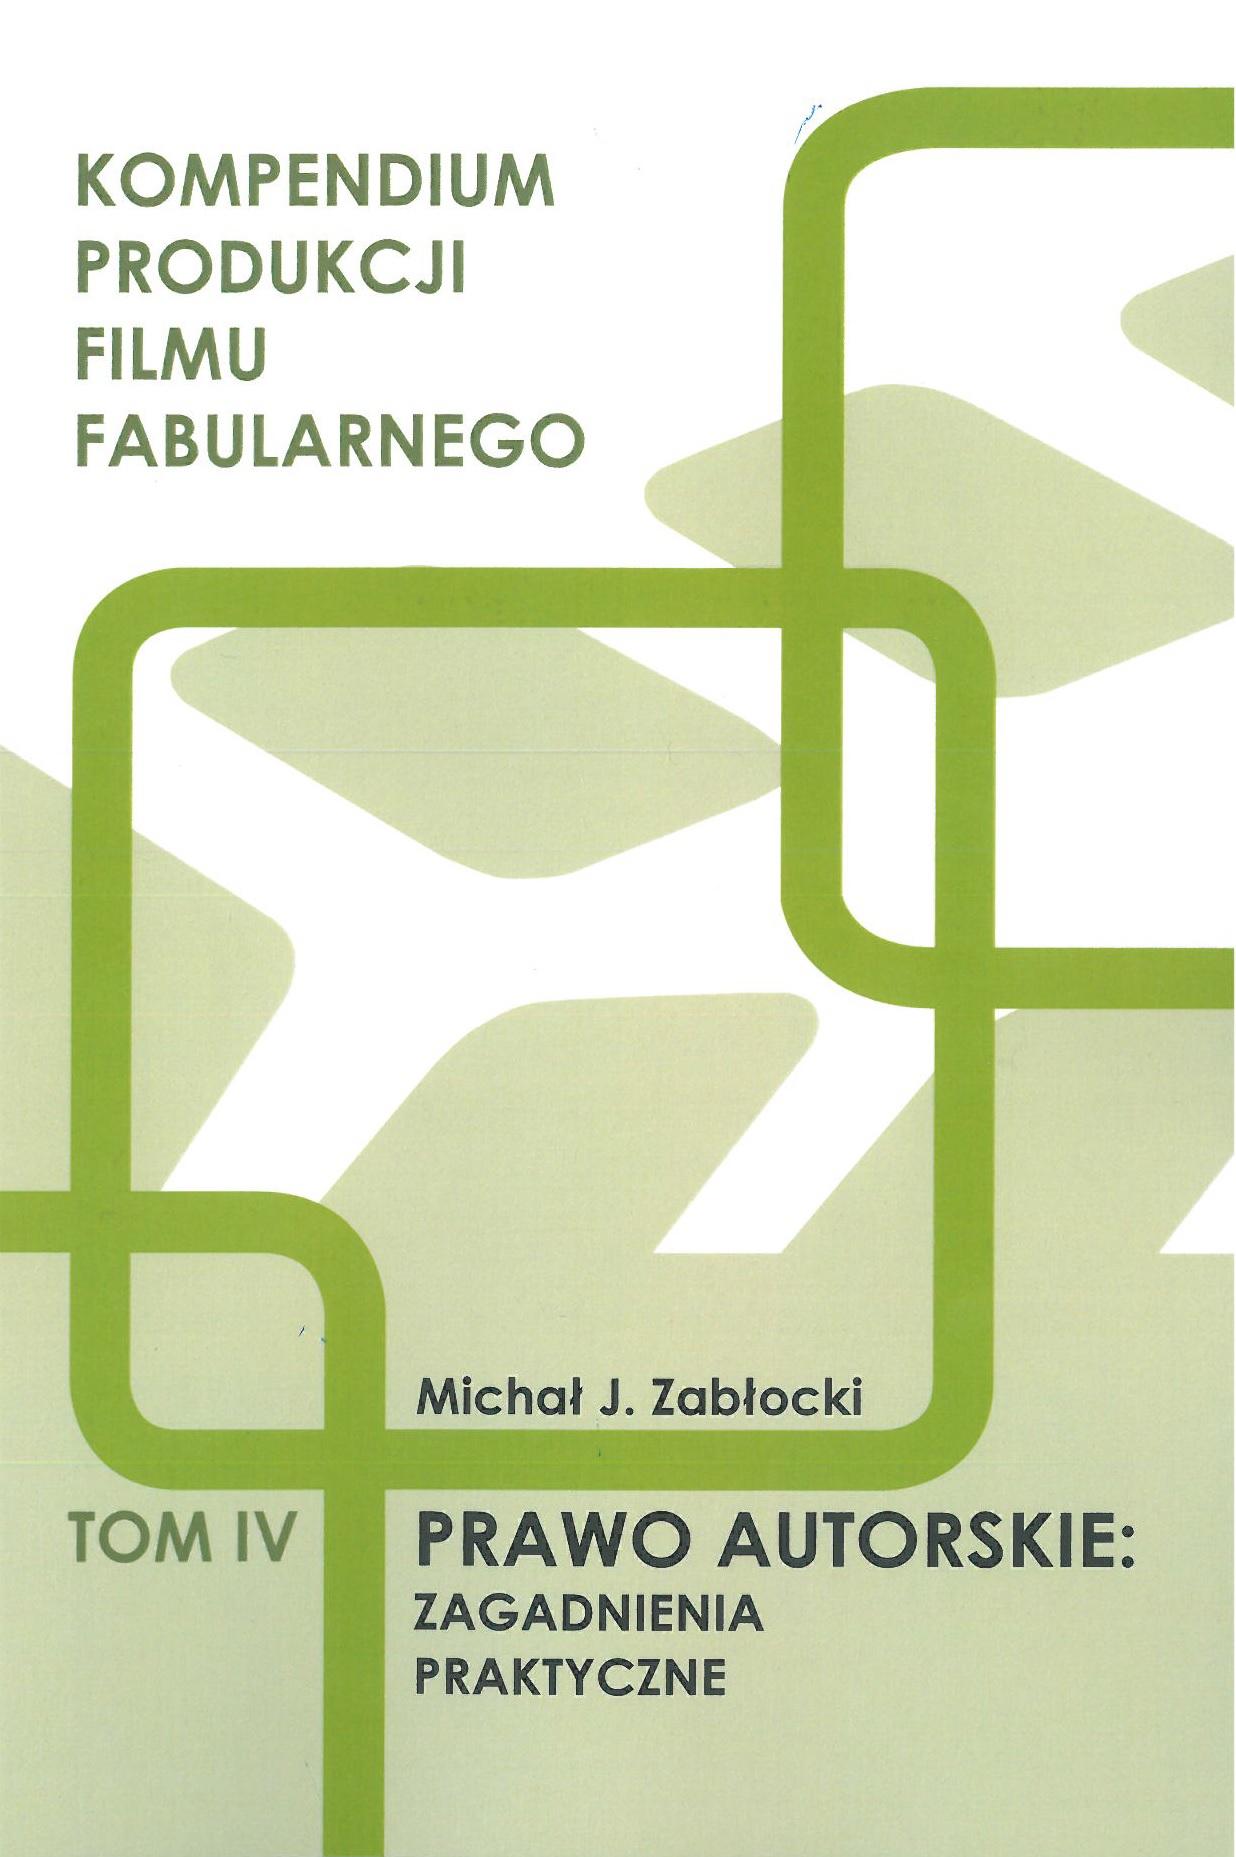 KOMPENDIUM PRODUKCJI FILMU FABULARNEGO